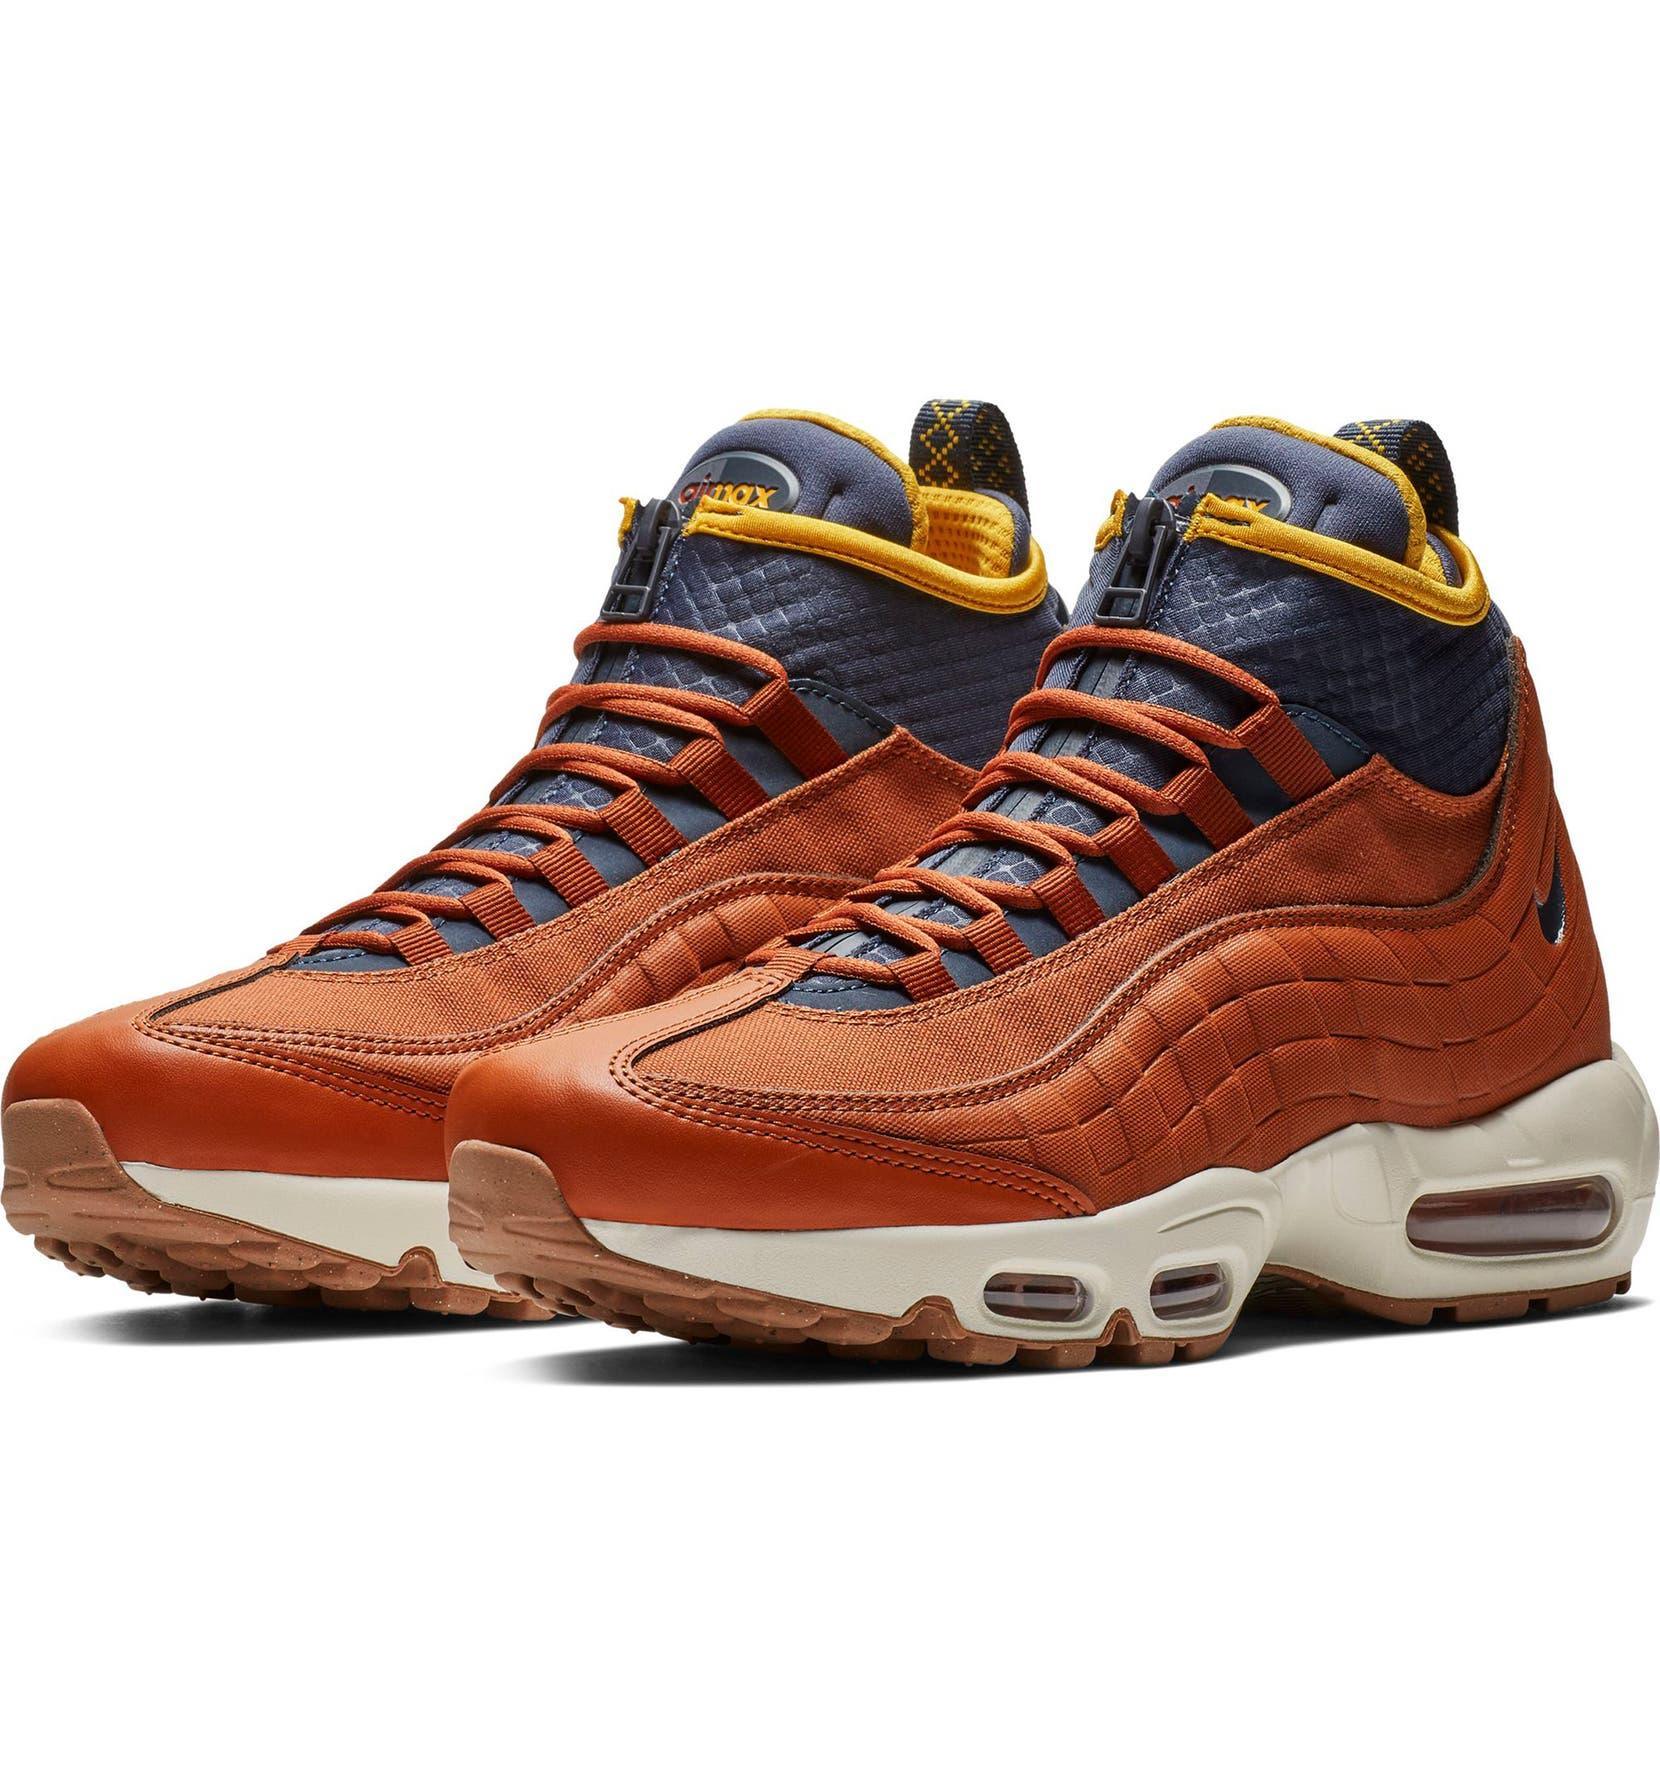 Nike Air Max 95 Sneaker Boots Mens